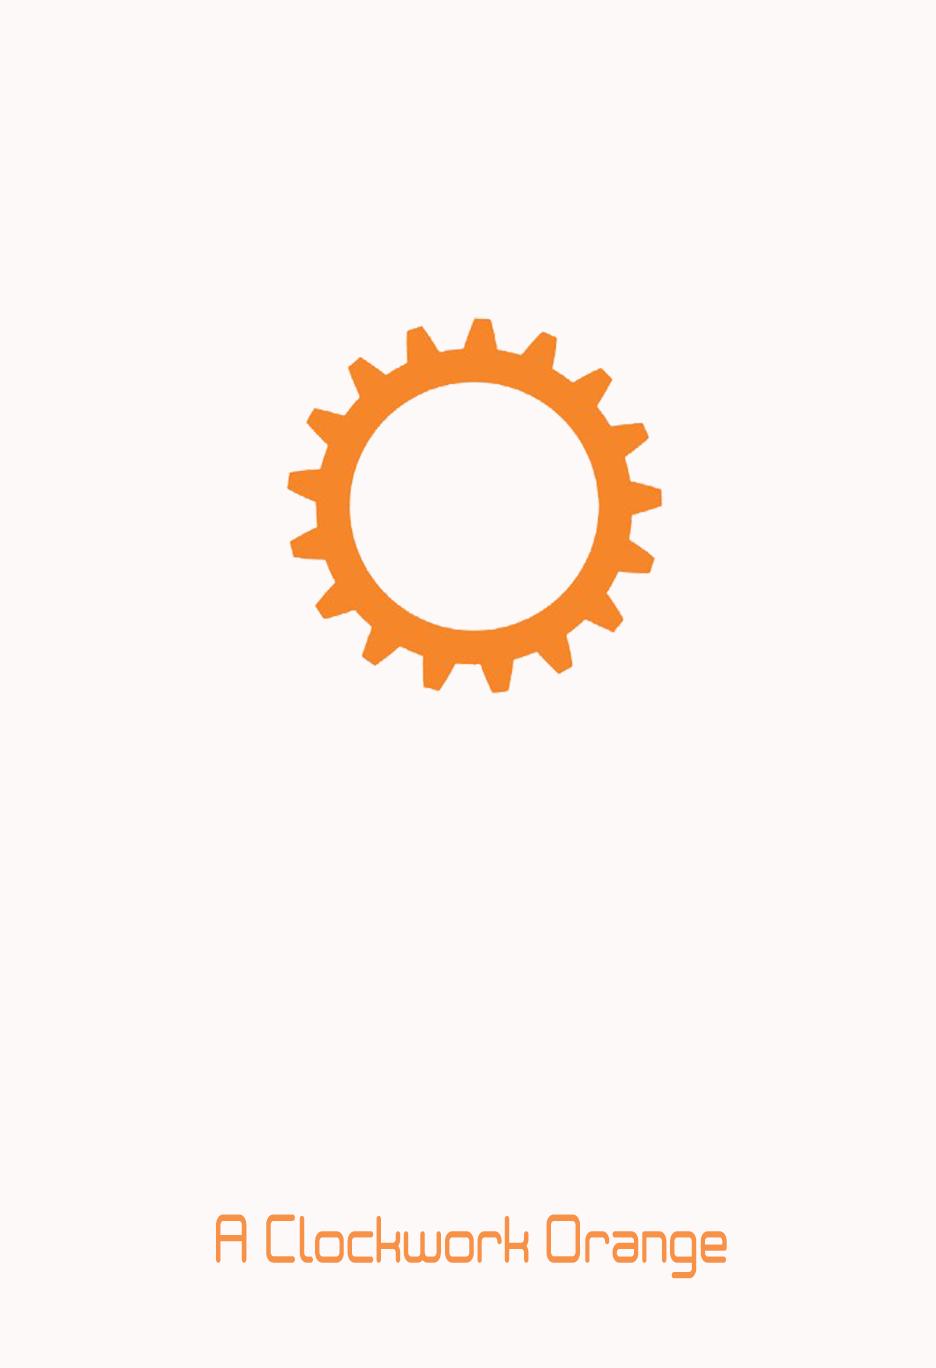 clockwork orange minimalist 1920x1200 - photo #31